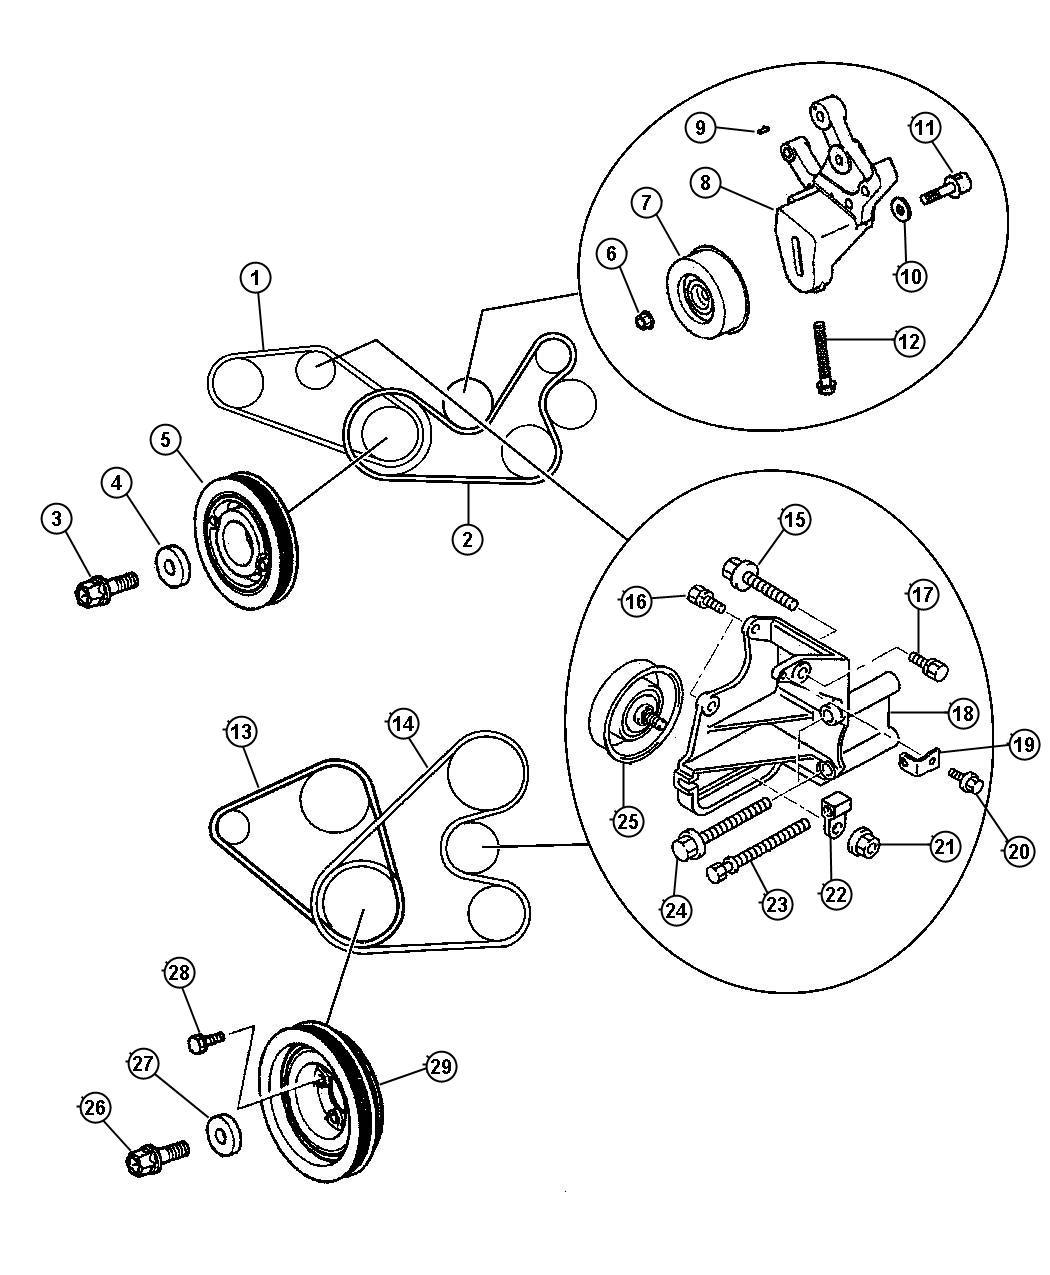 Dodge Stratus Pin